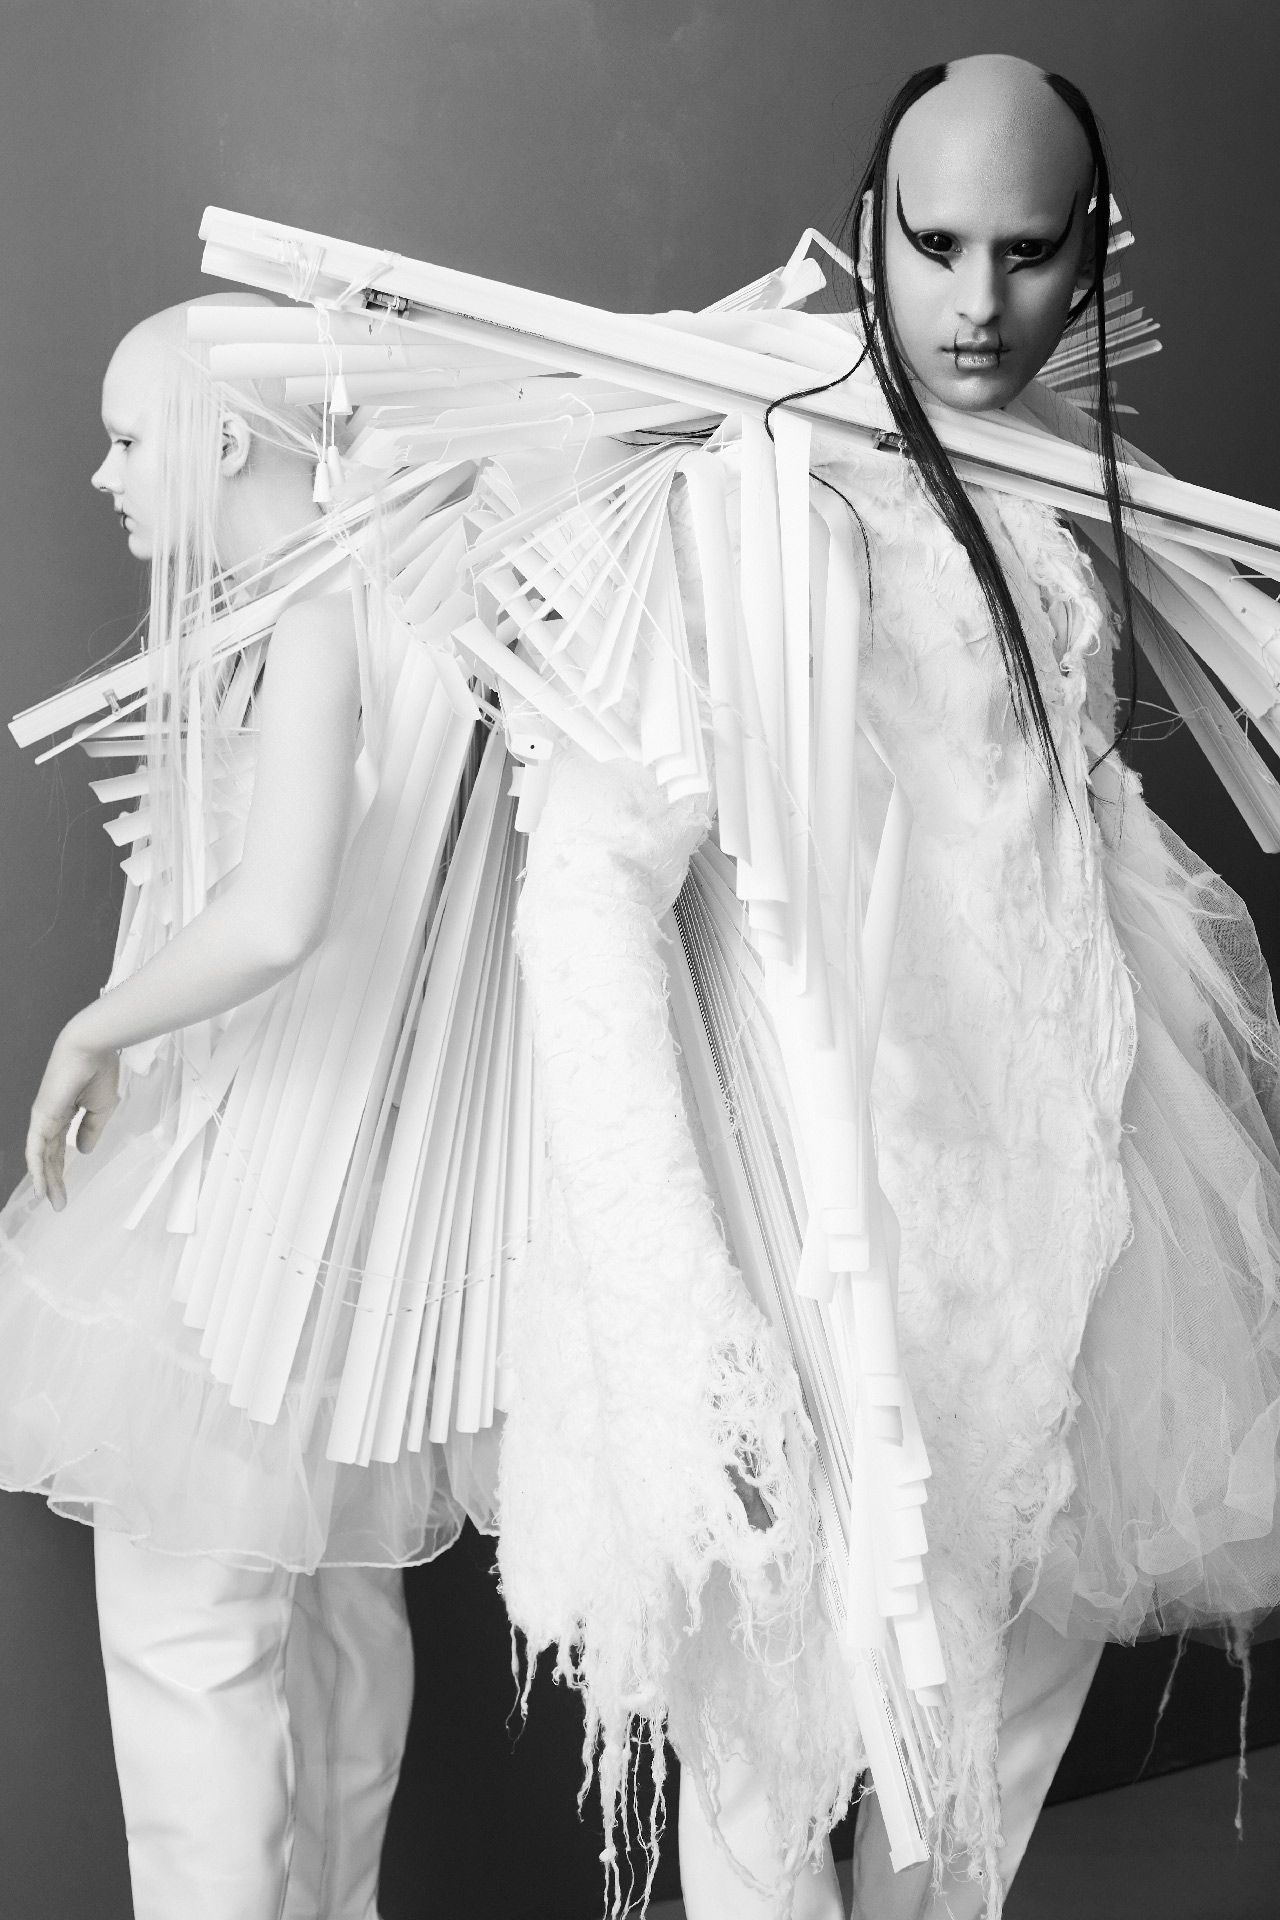 Max Abadian (born in 1967), Atelier New Regime (Koku and Gildas Awuye), 2019, digital print. Maxville Studios, Montreal